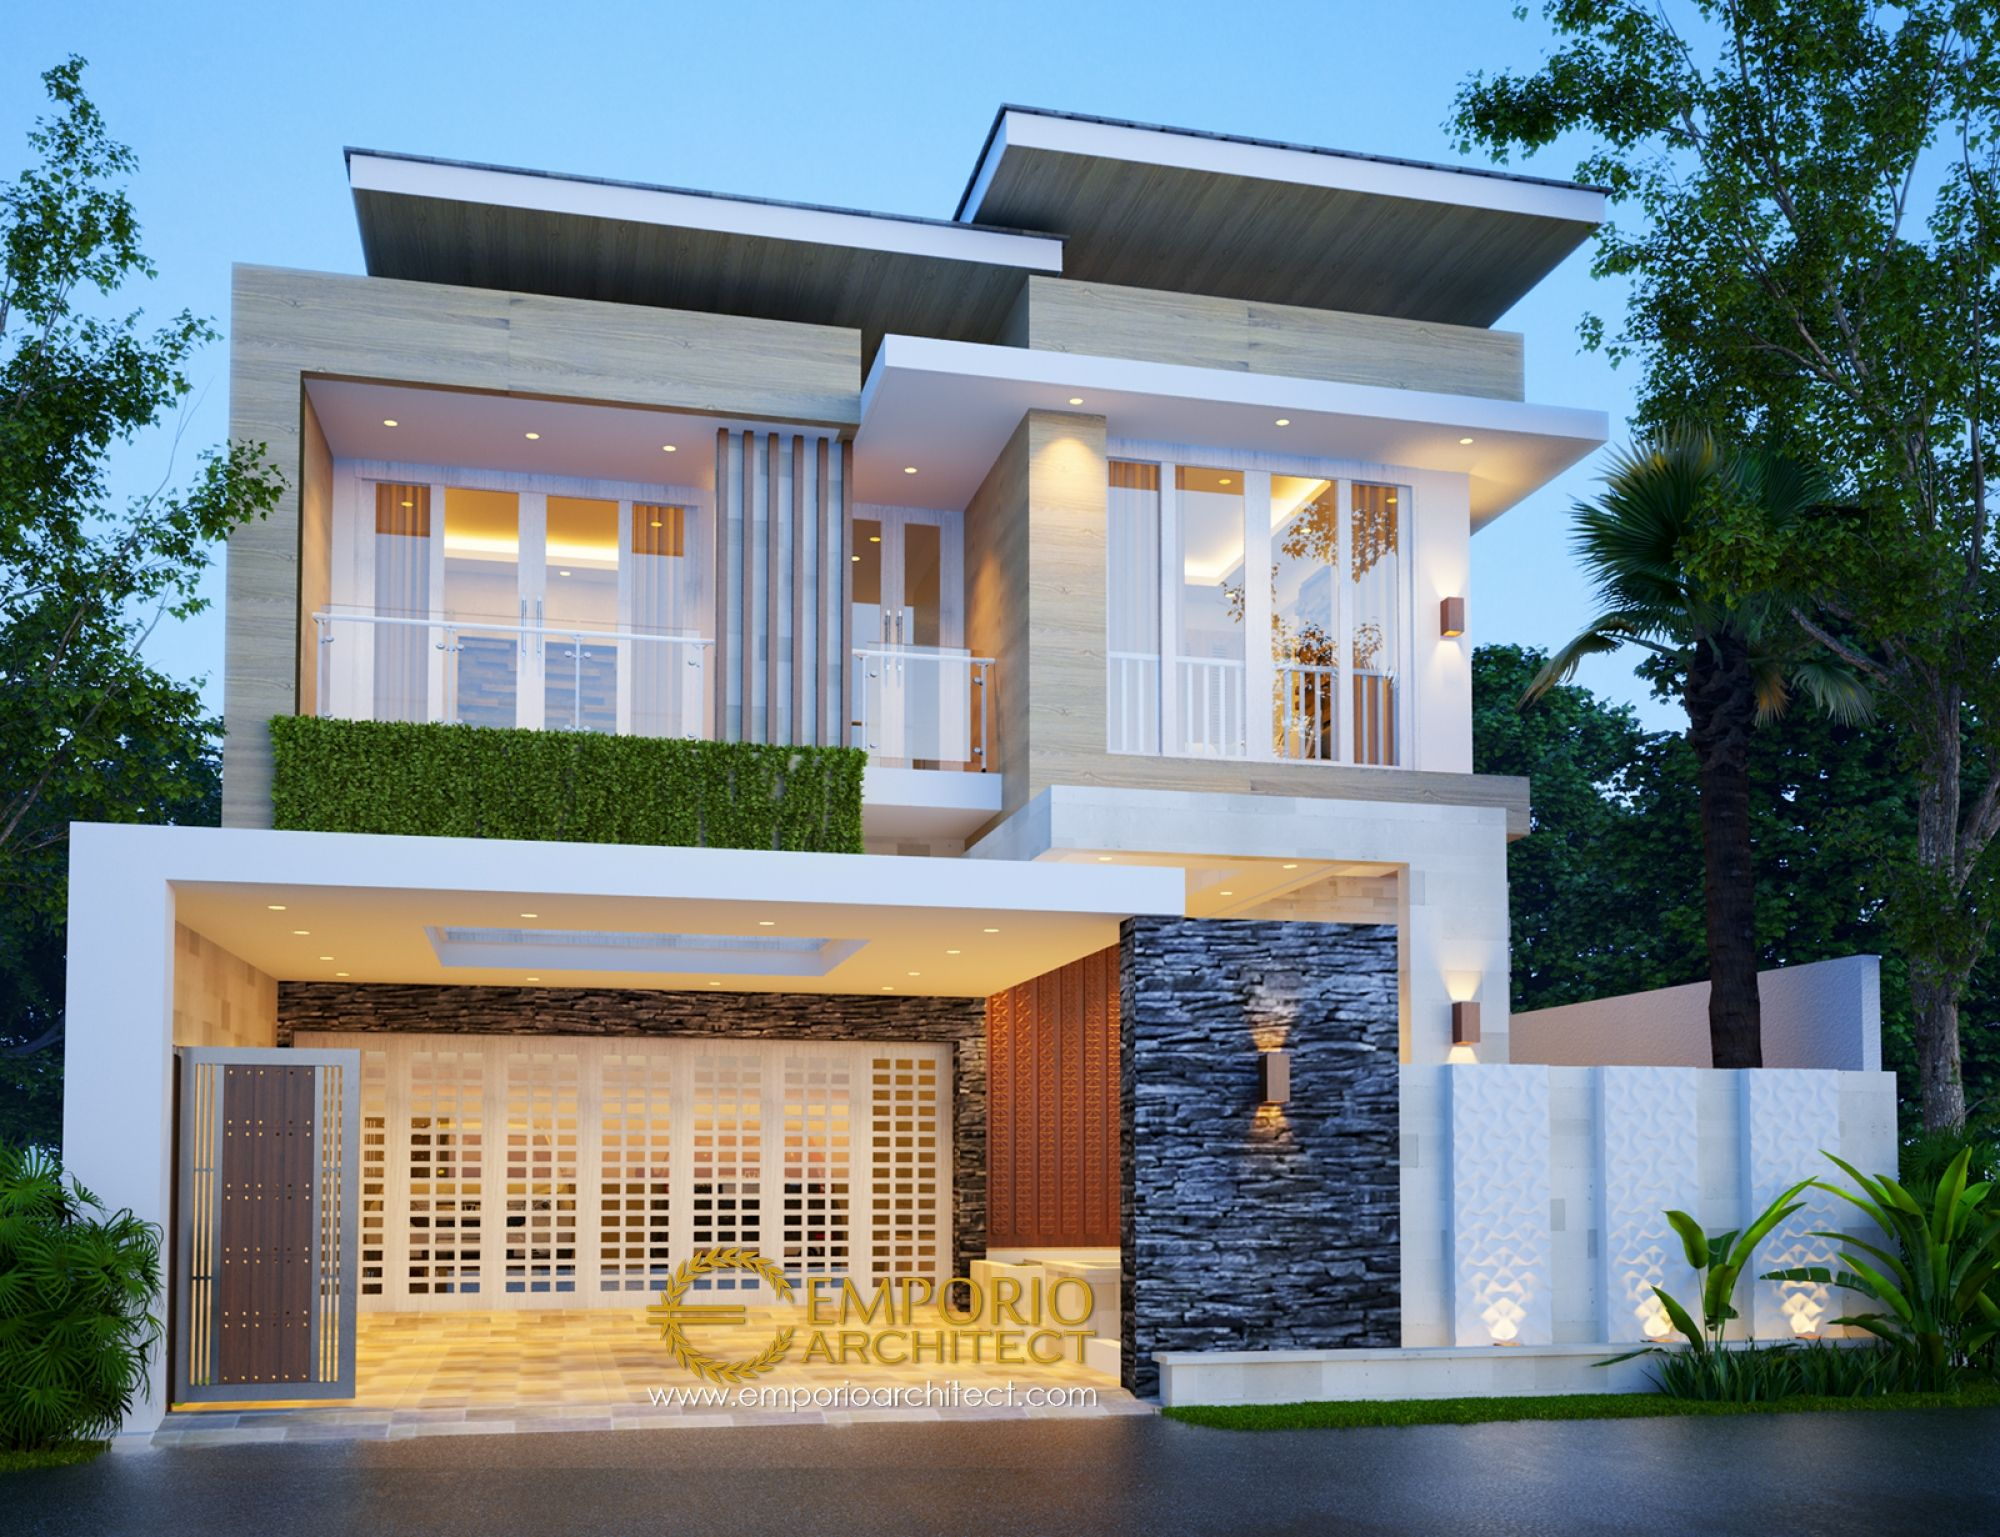 Desain Rumah Villa Minimalis Modern Cek Bahan Bangunan